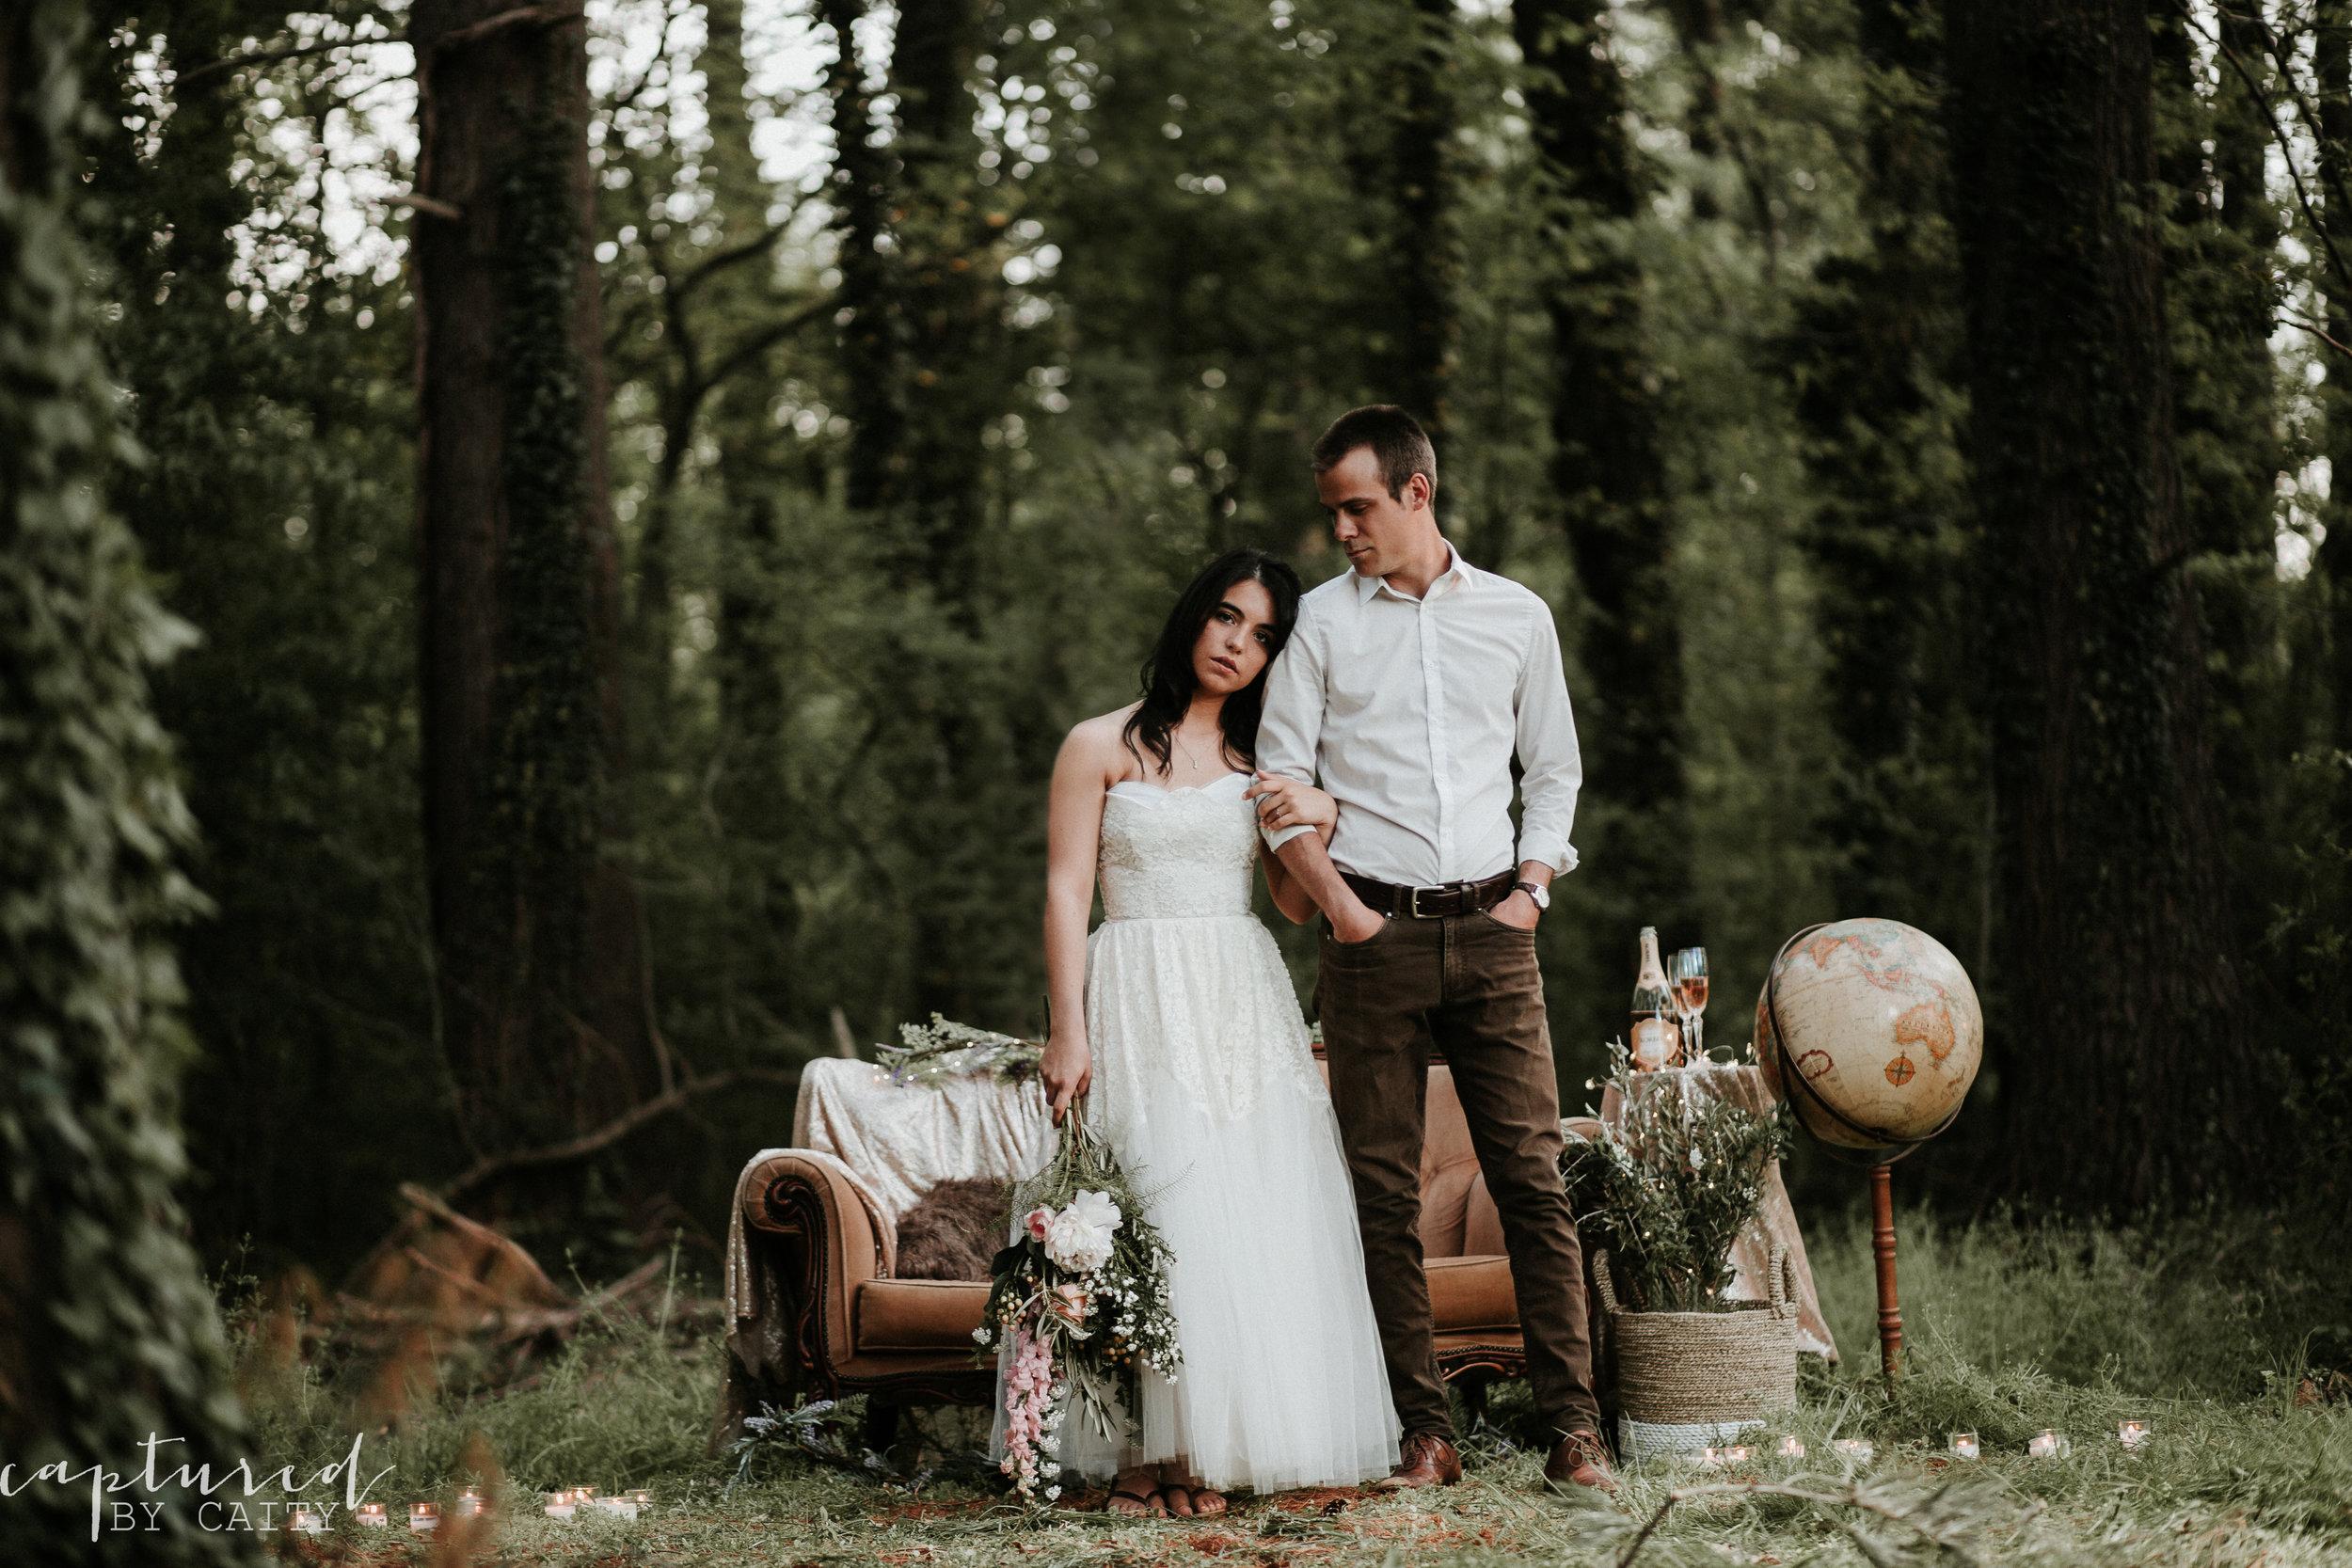 Wissahickon Trail - Styled Wedding Shoot